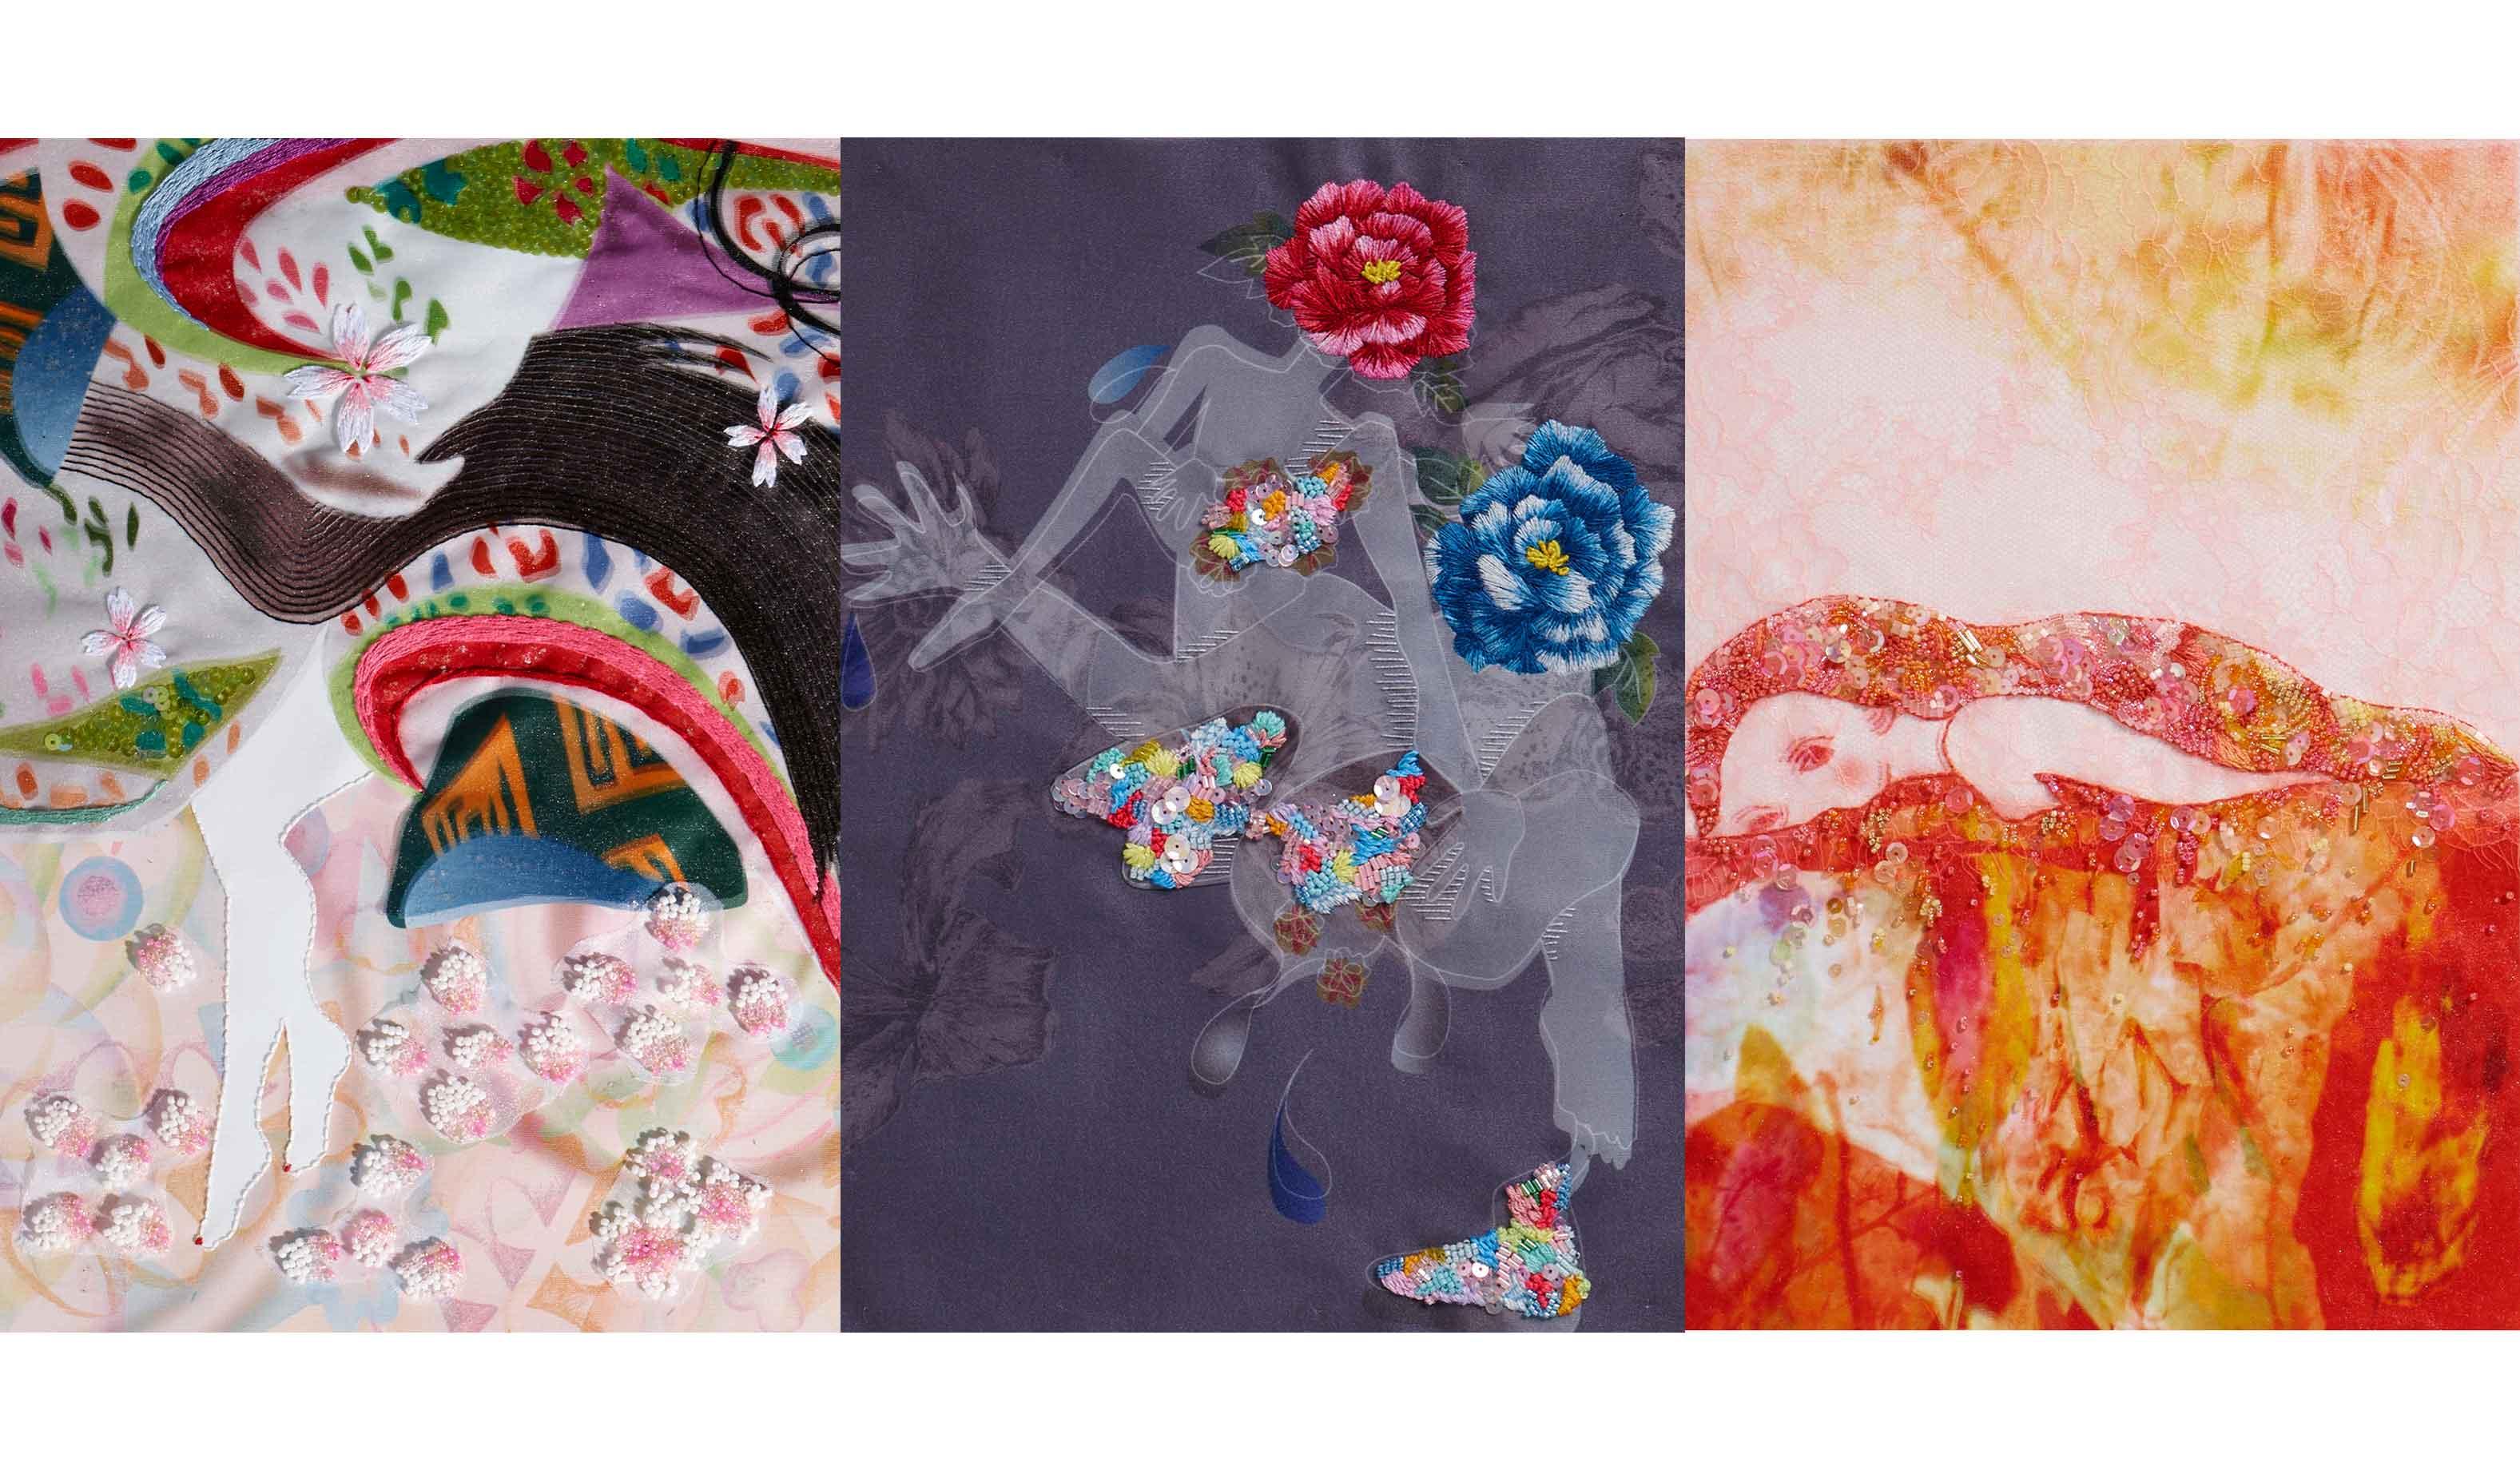 ART|アーティスト清川あさみによる「千年後の百人一首」原画展